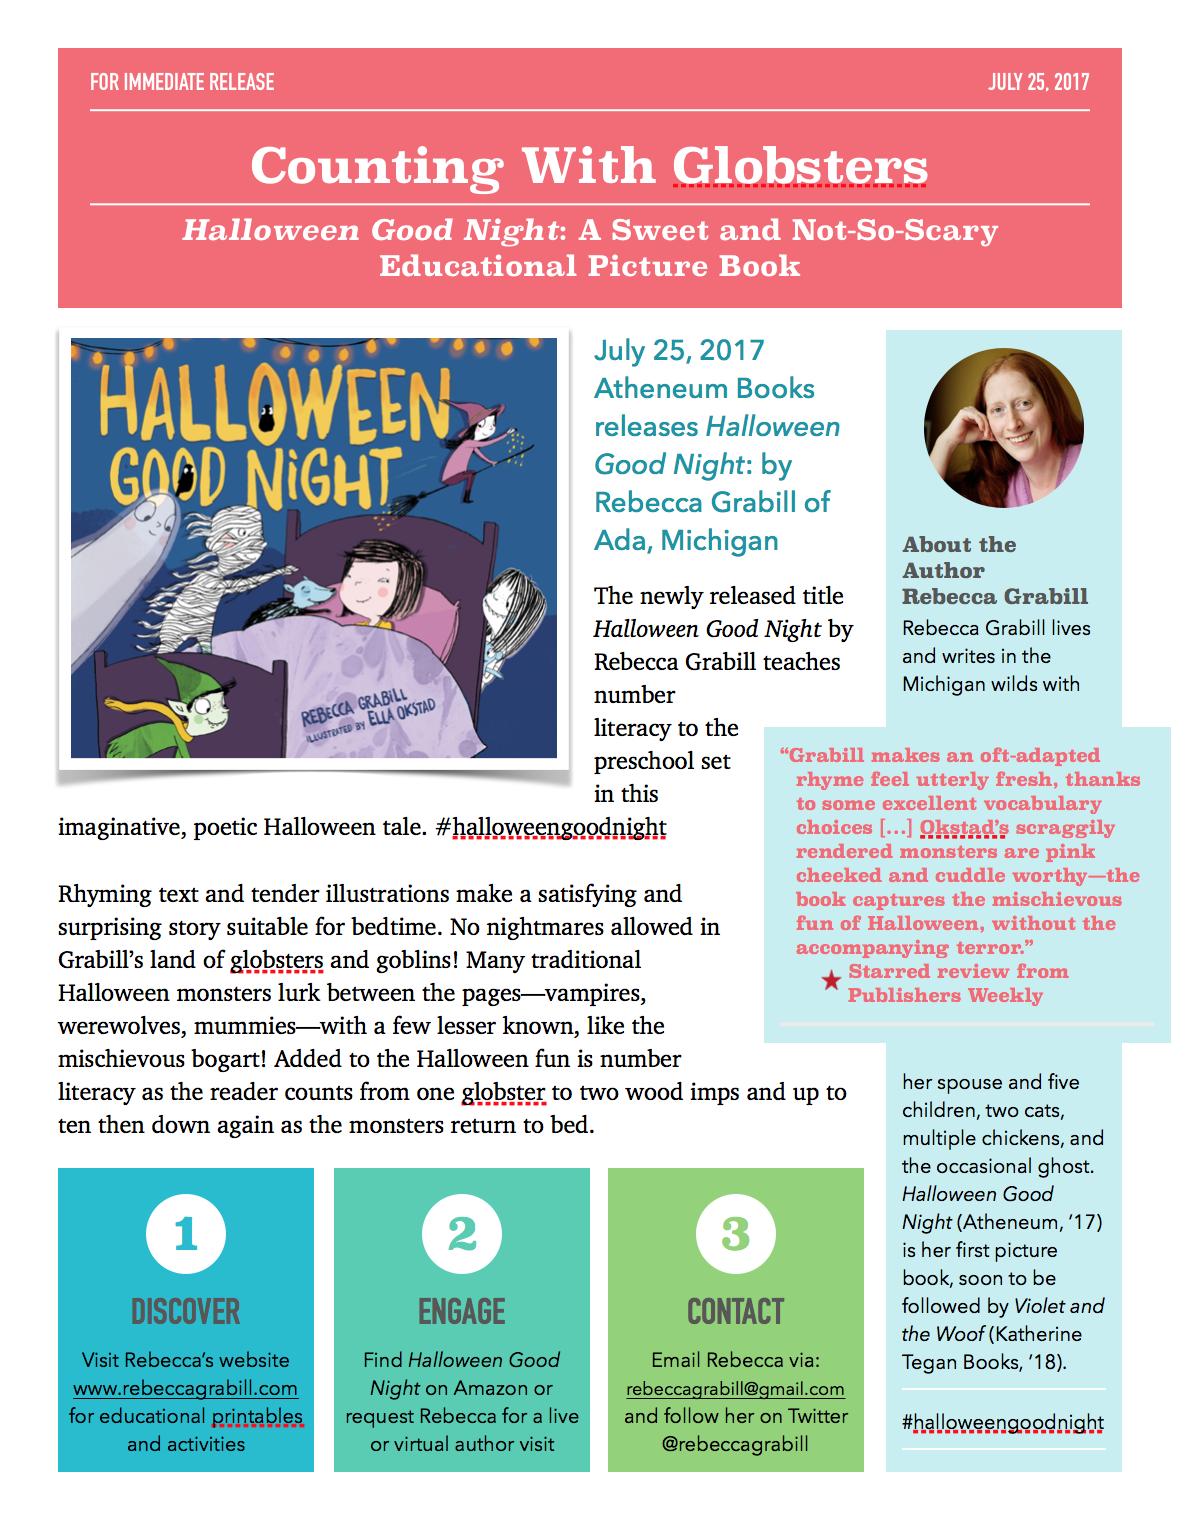 Halloween Good Night By Rebecca Grabill Press Release